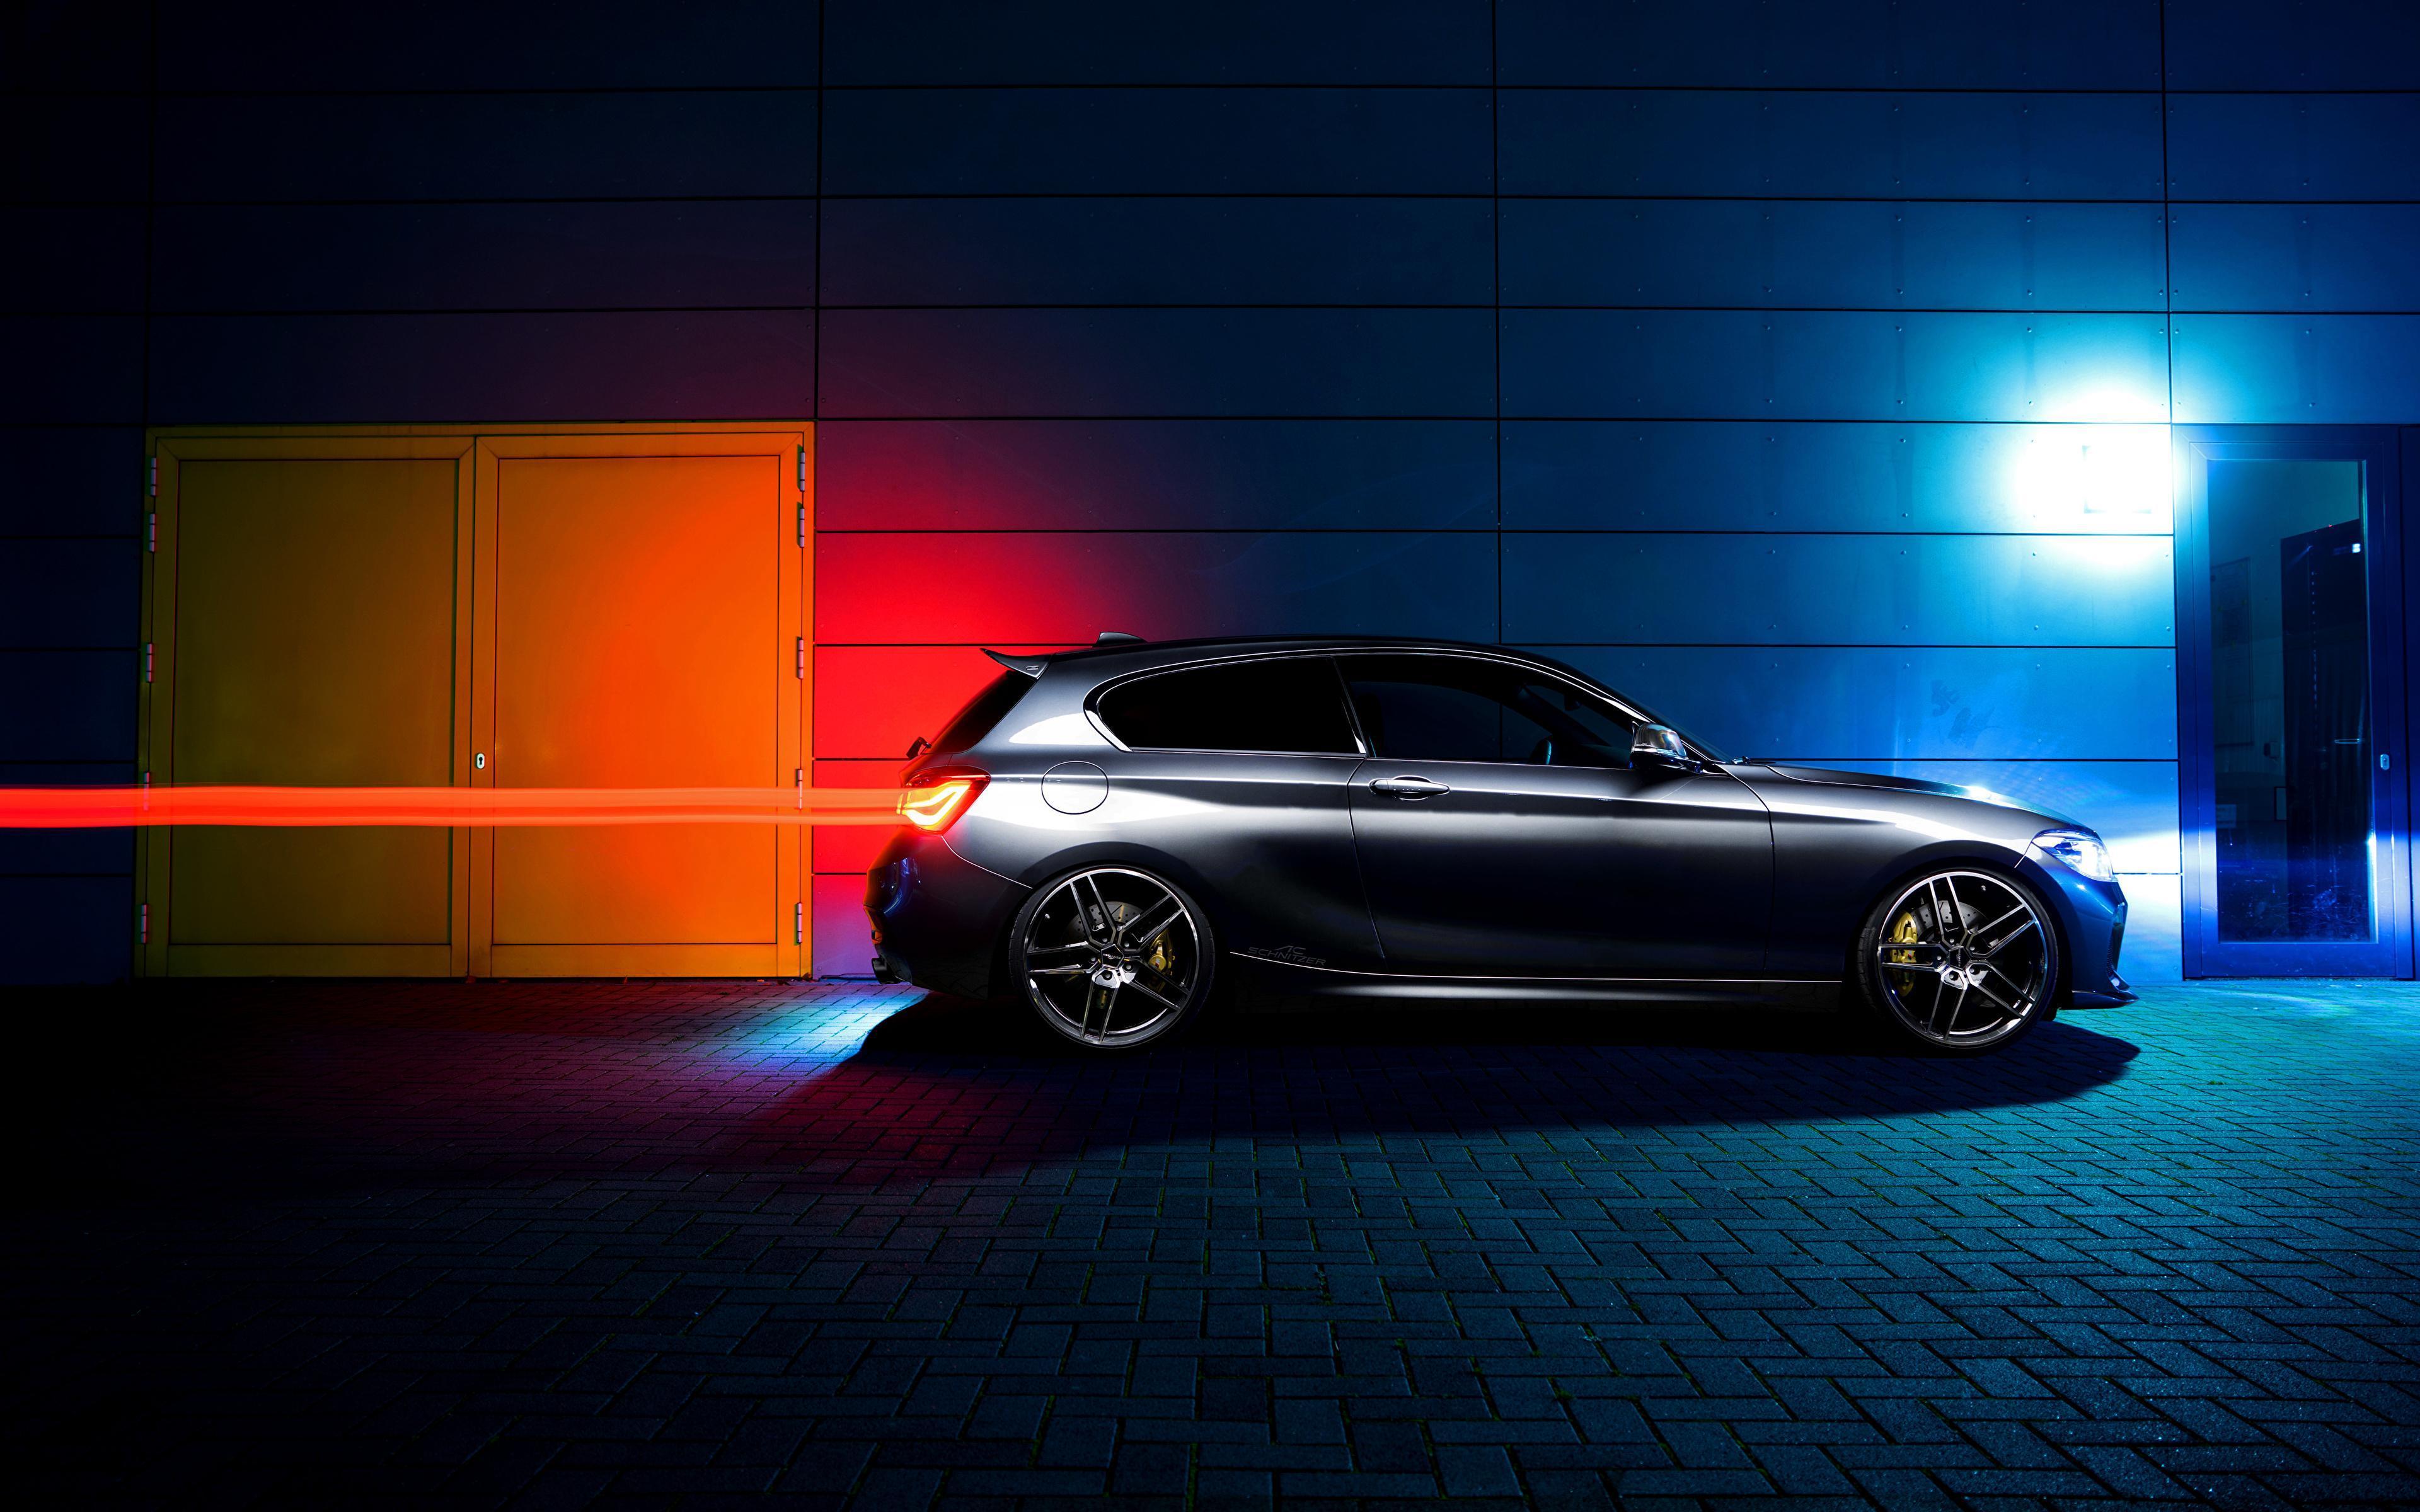 Desktop F20 BMW Wallpapers - Wallpaper Cave